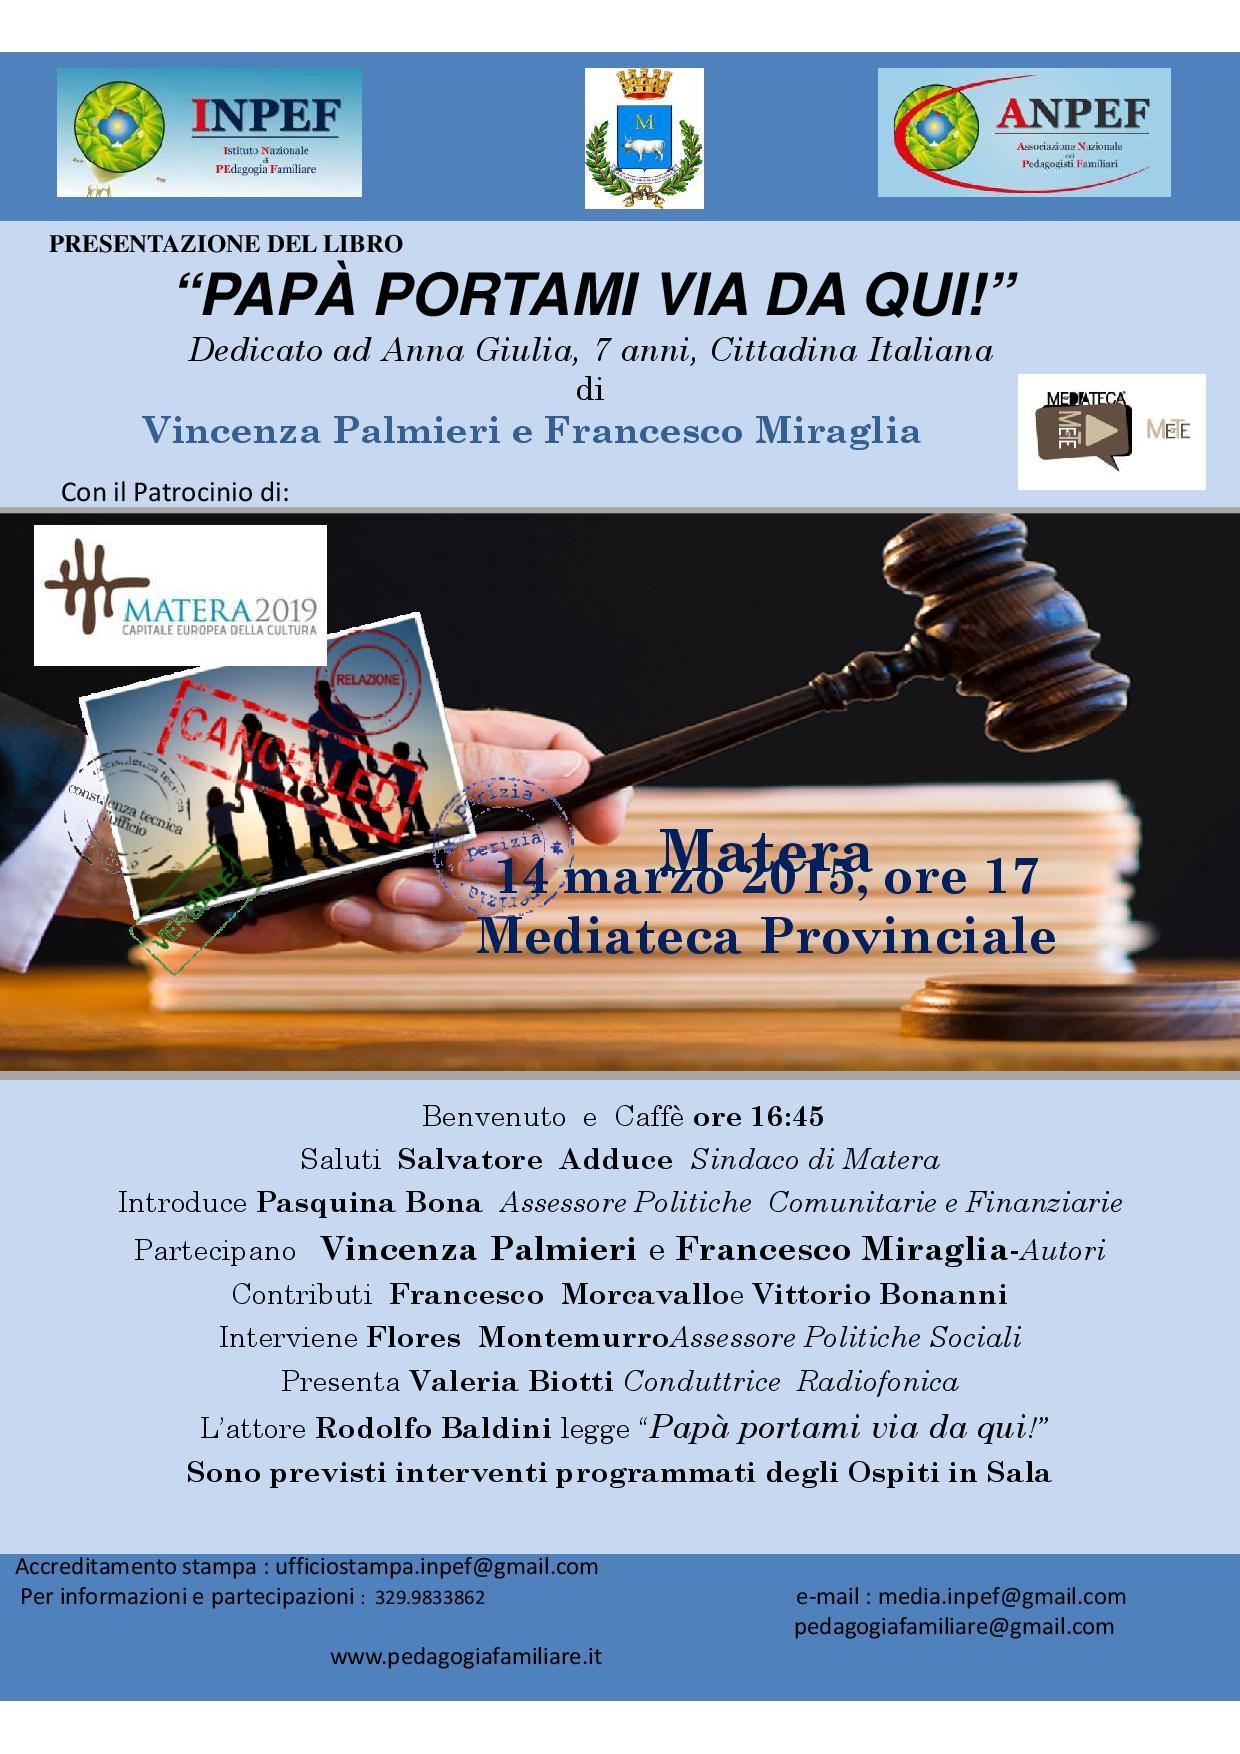 PAPA  PORTAMI VIA def pdf 27 febbraio (1) (2)-page-001